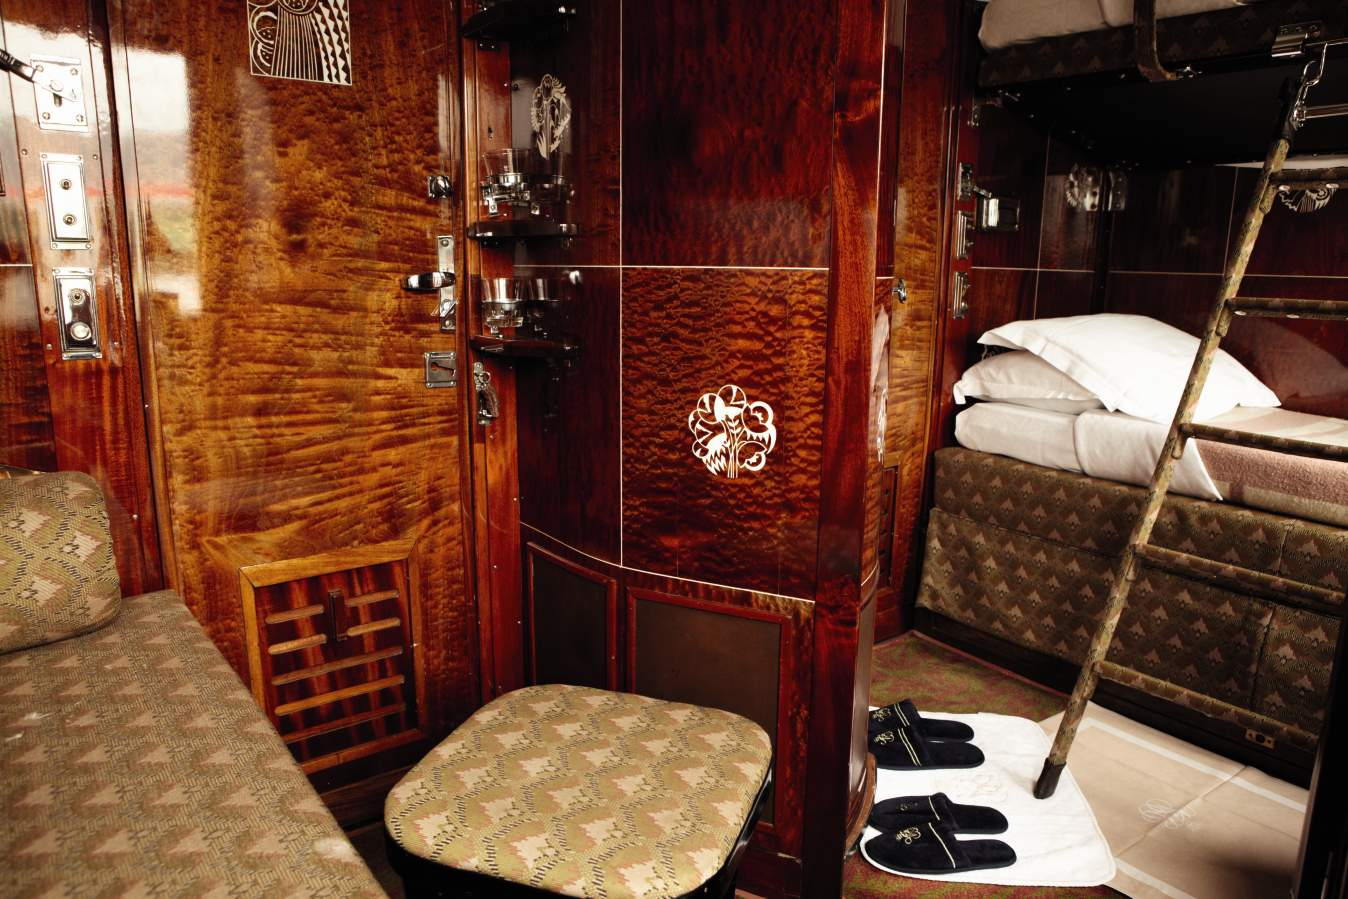 Venice Orient Express (2)